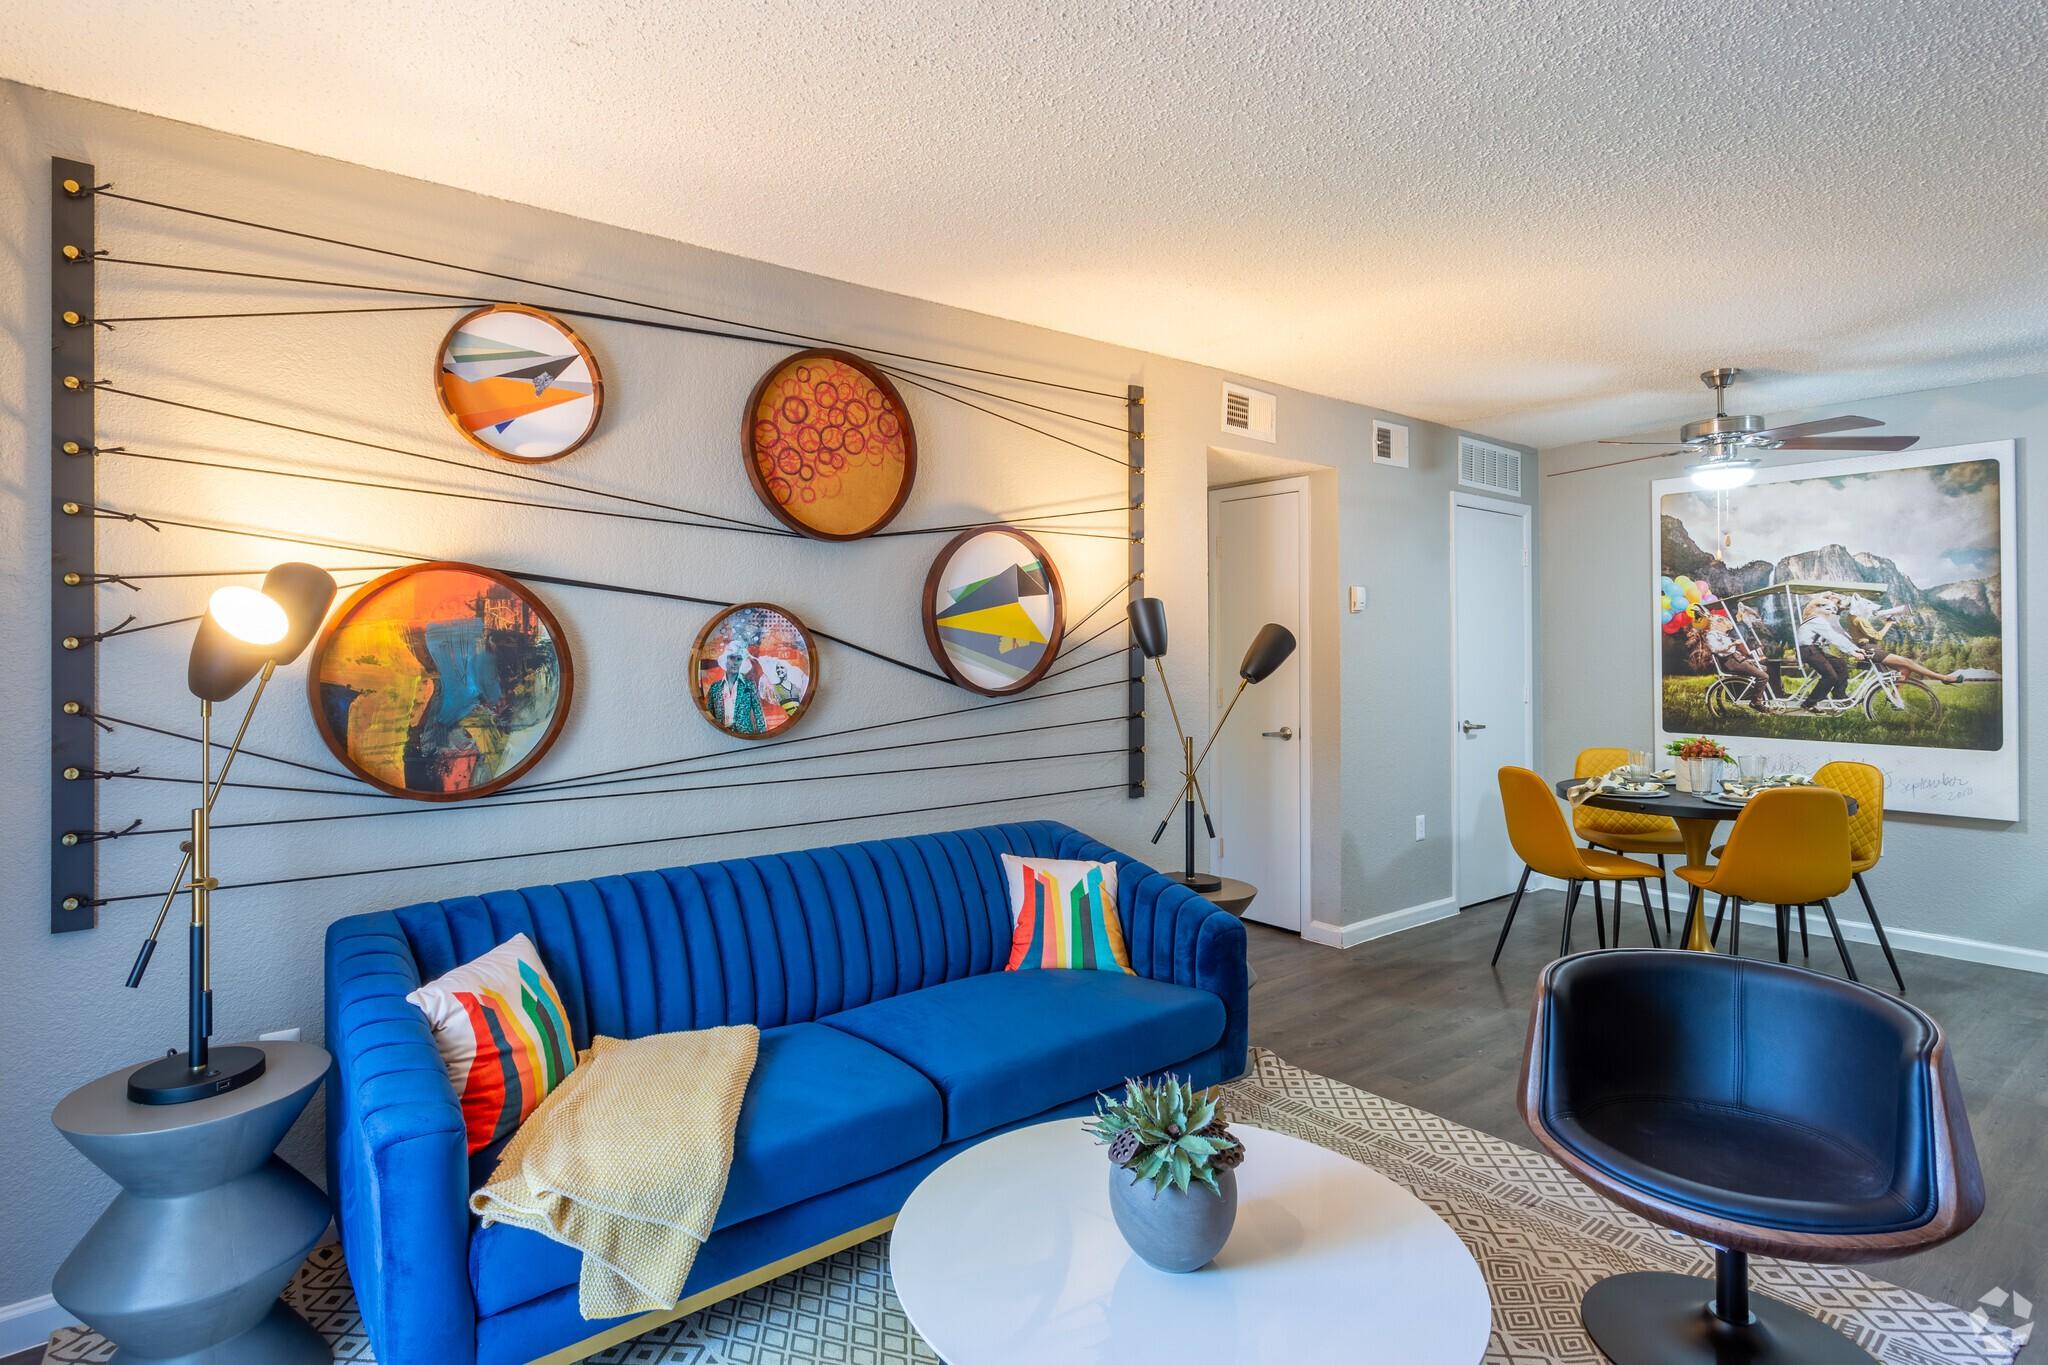 Apartments Near UT Austin Orbit for University of Texas - Austin Students in Austin, TX